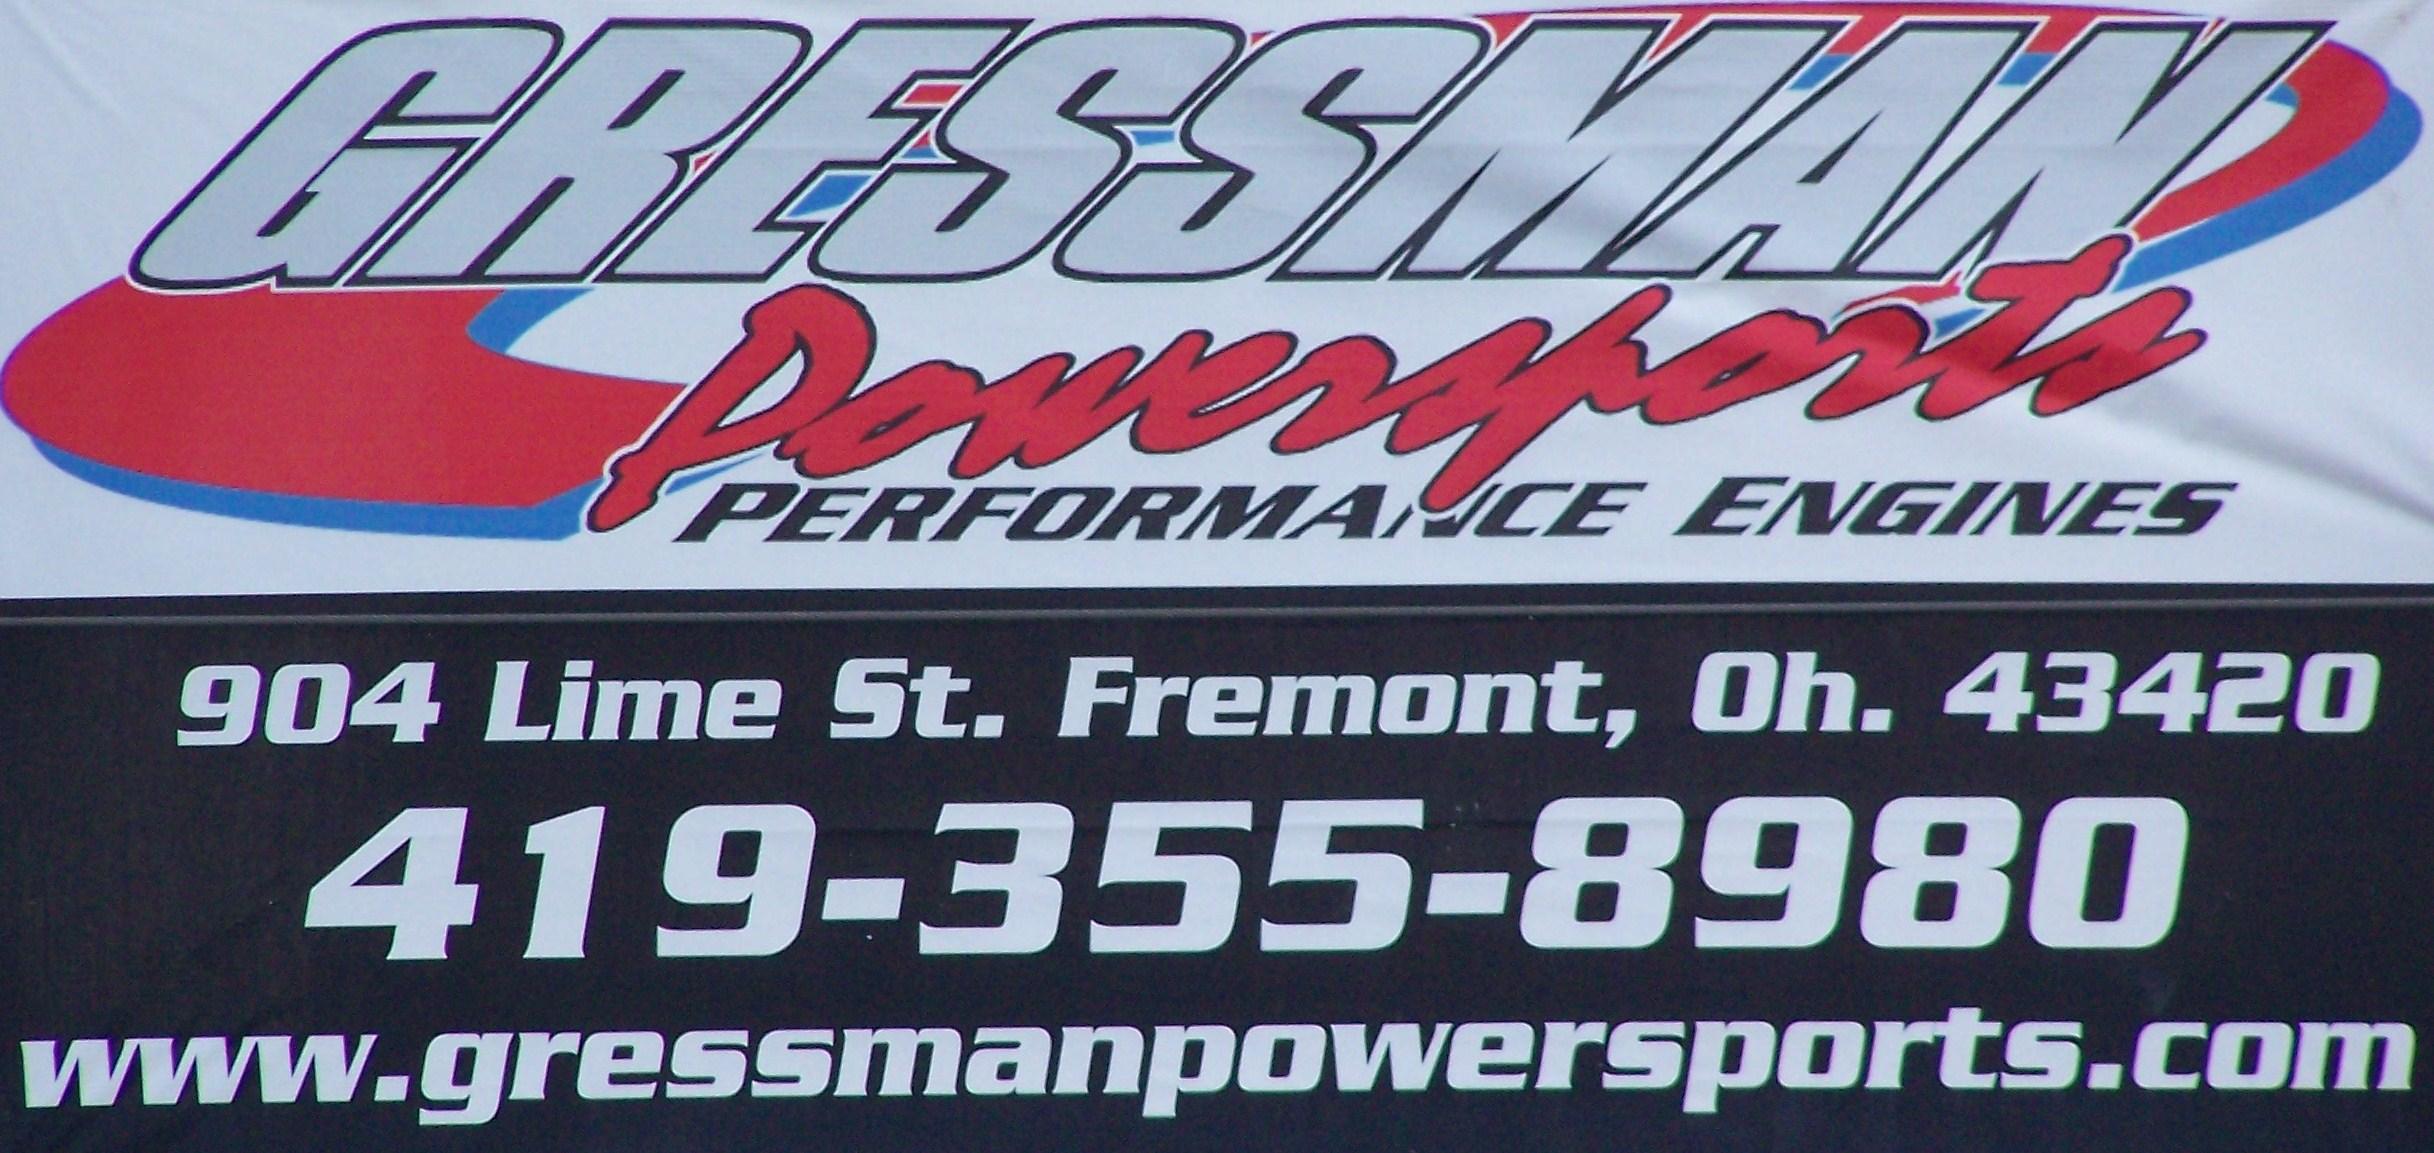 Gressman Powersports